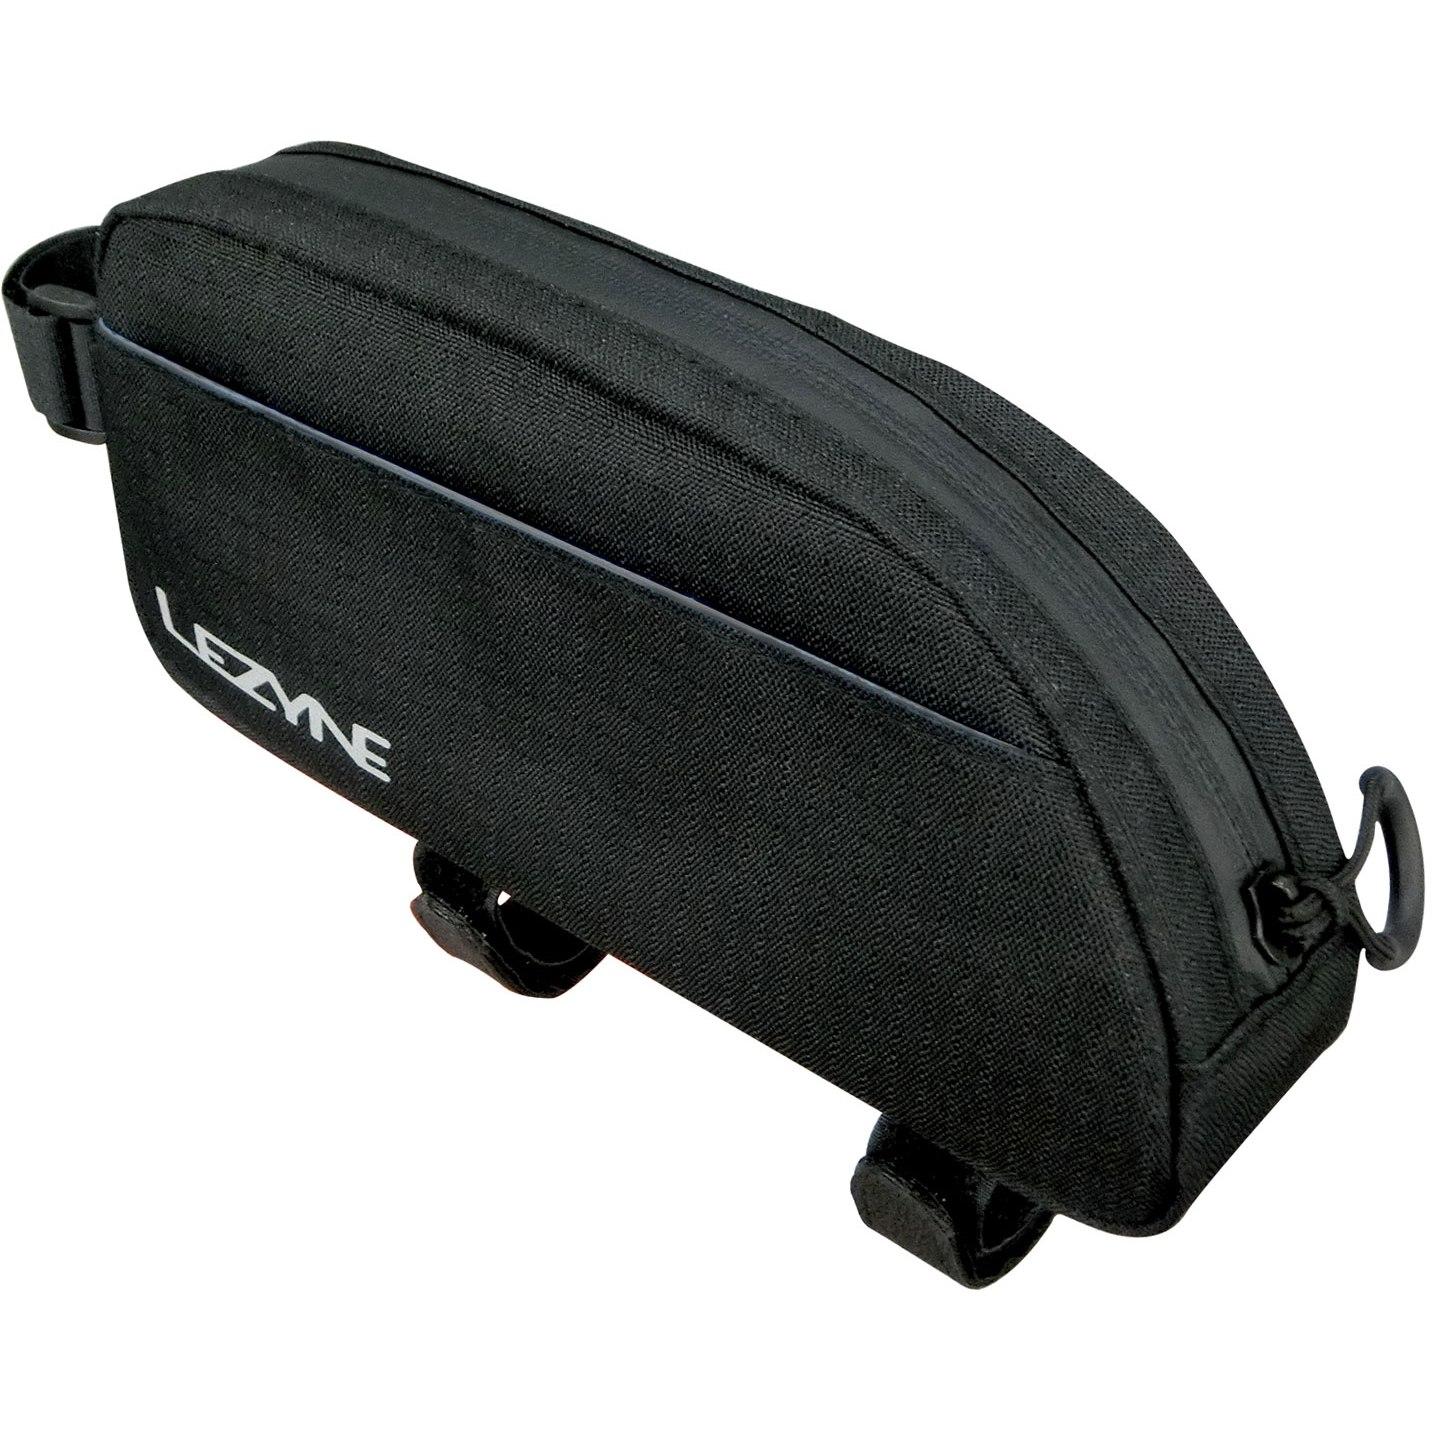 Image of Lezyne Energy Caddy XL Frame Bag - black